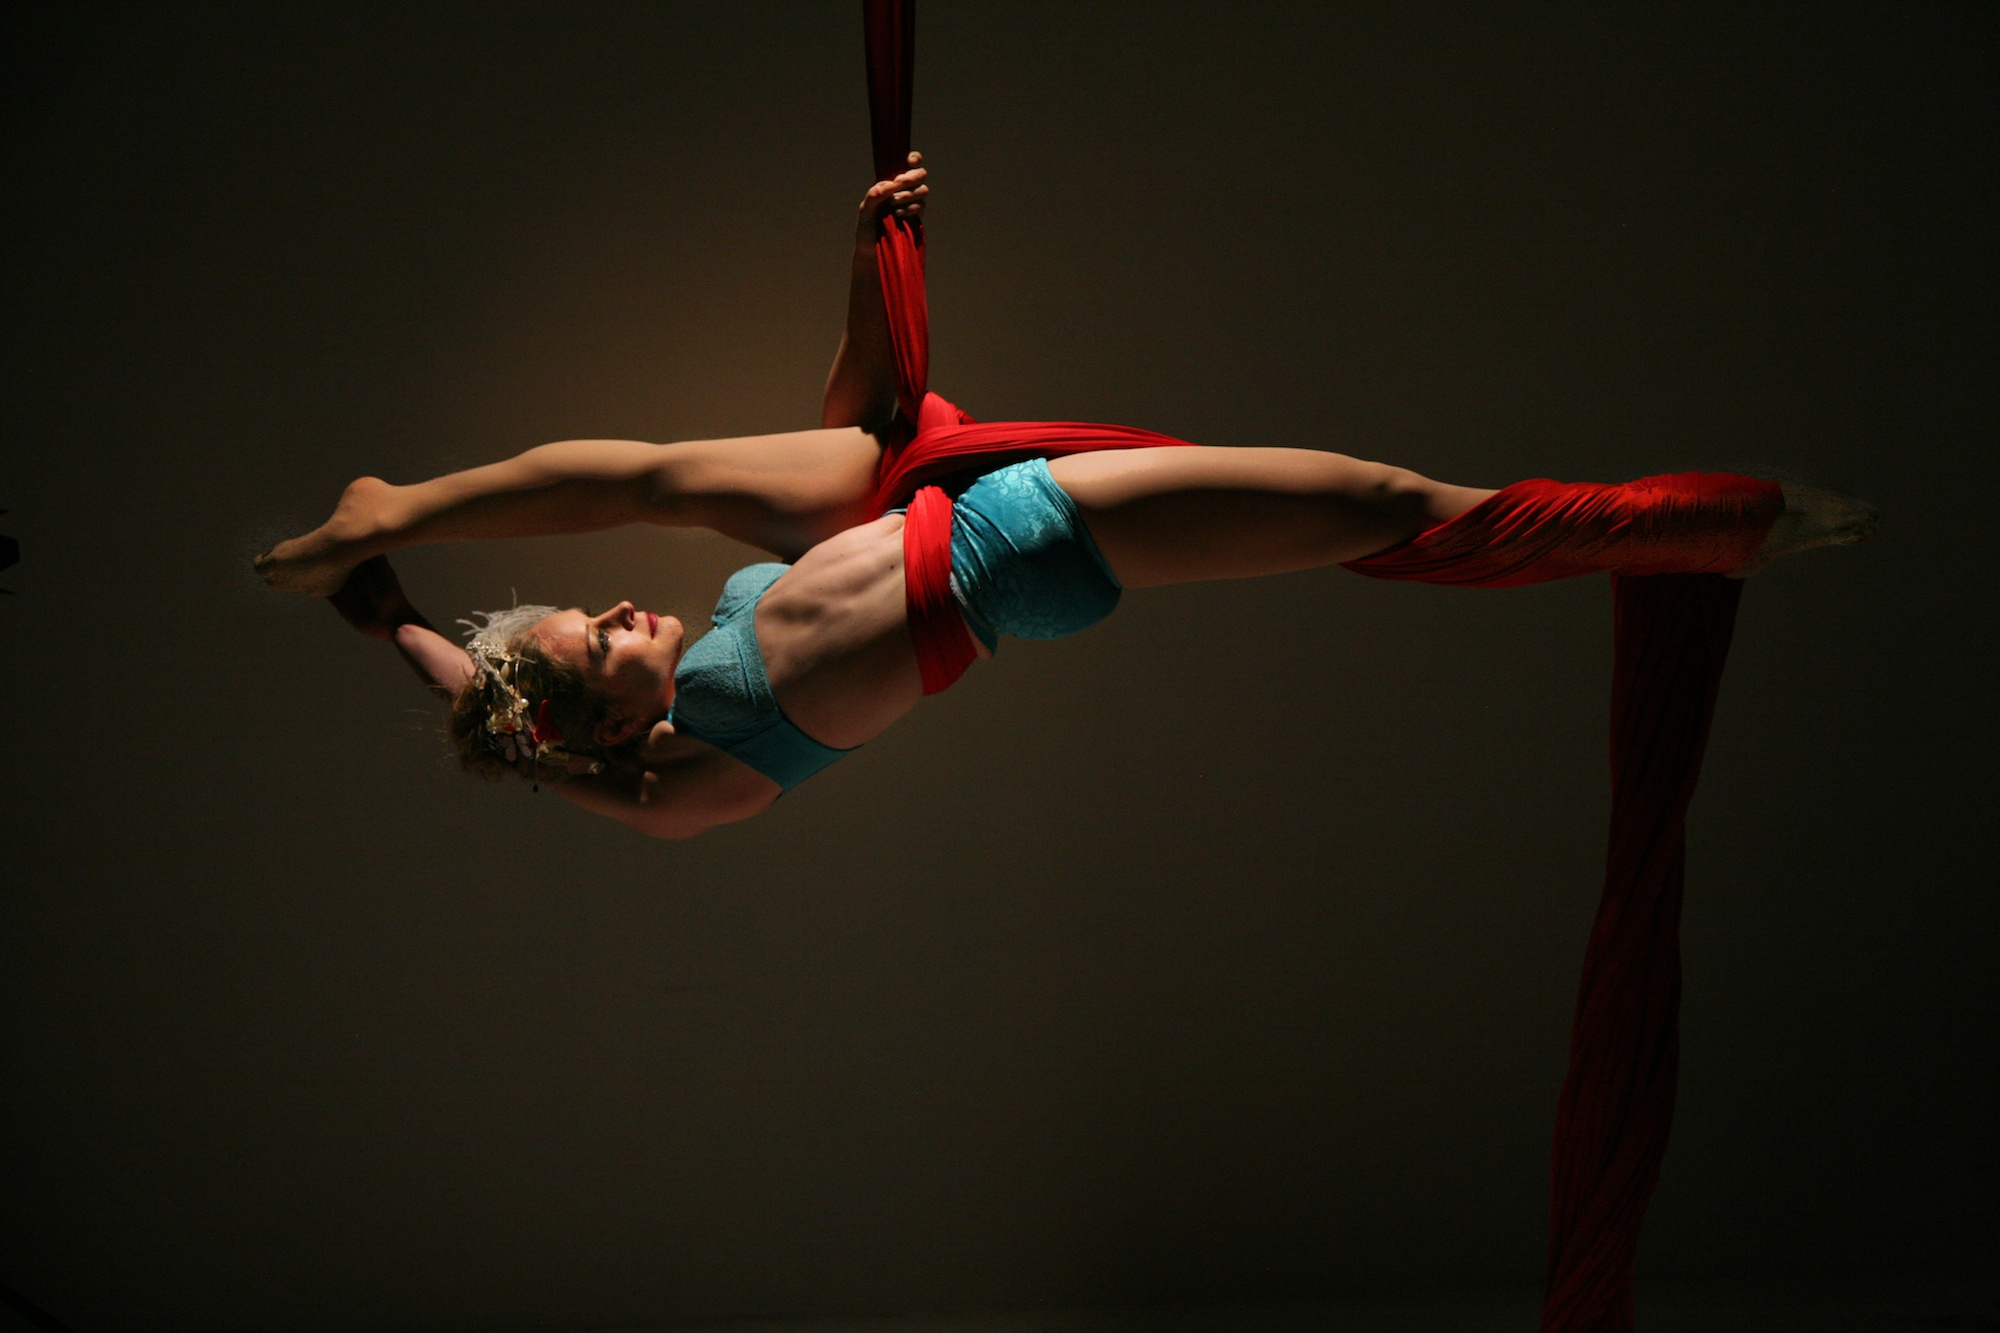 Lilli Muehleisen Aerial Silks